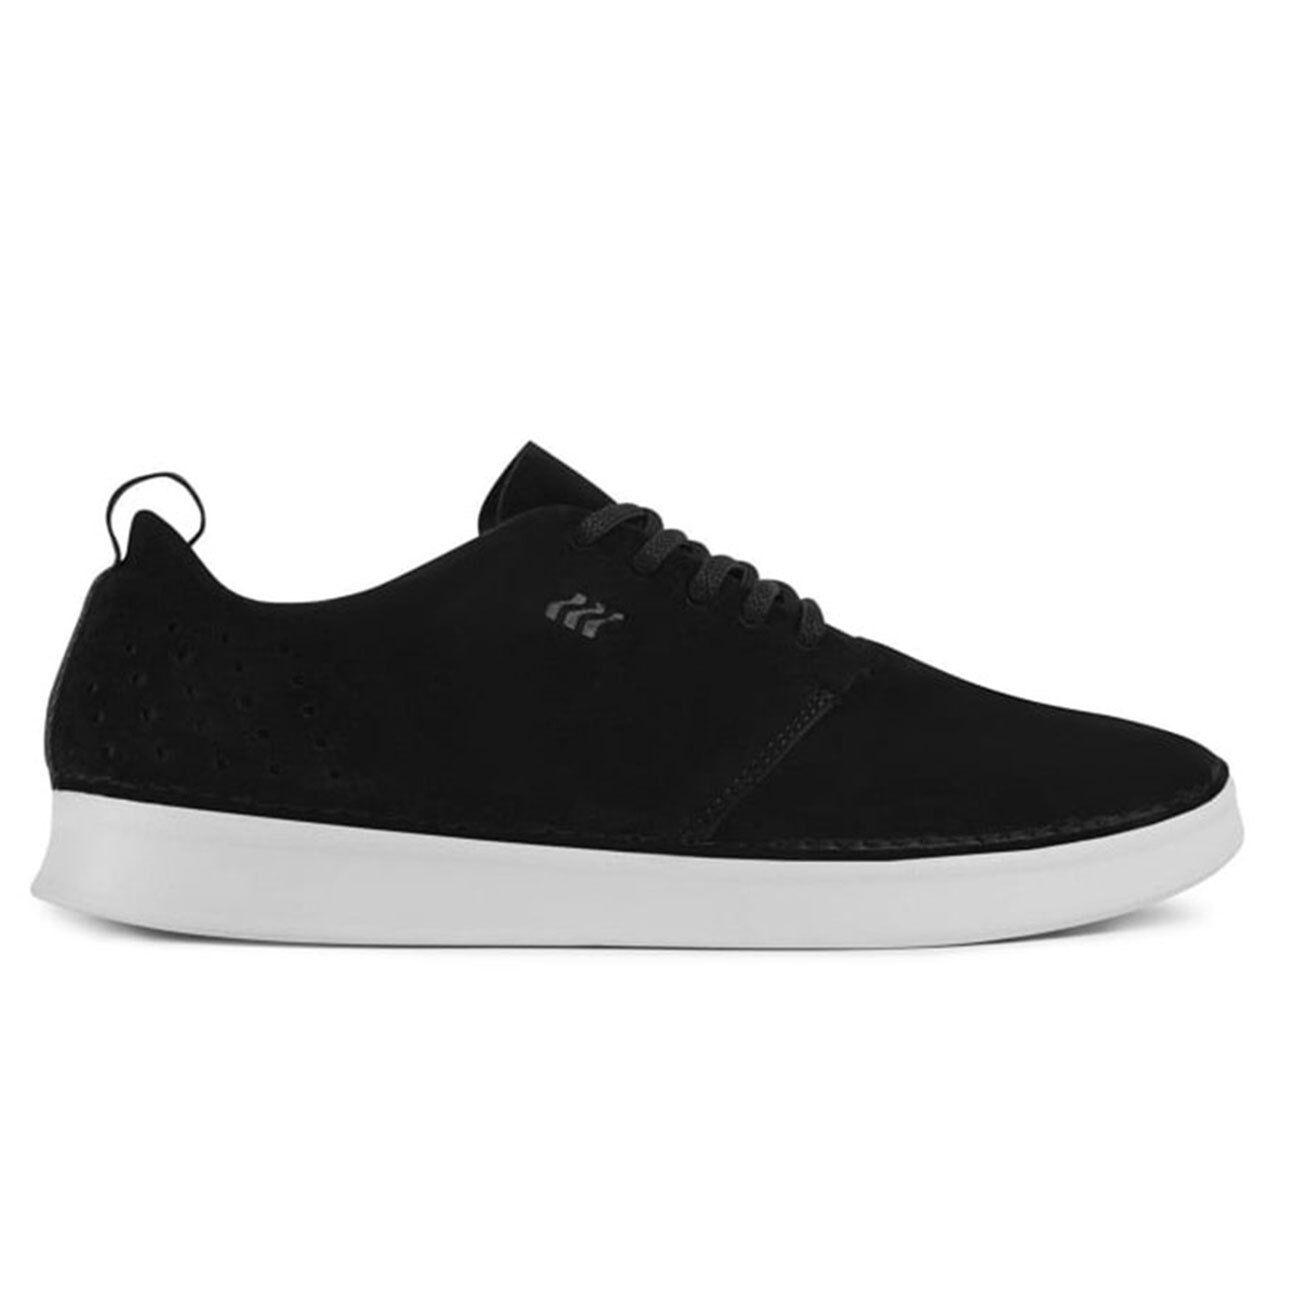 Boxfresh Herren Sneaker CARLE UH PGSDE - BLK